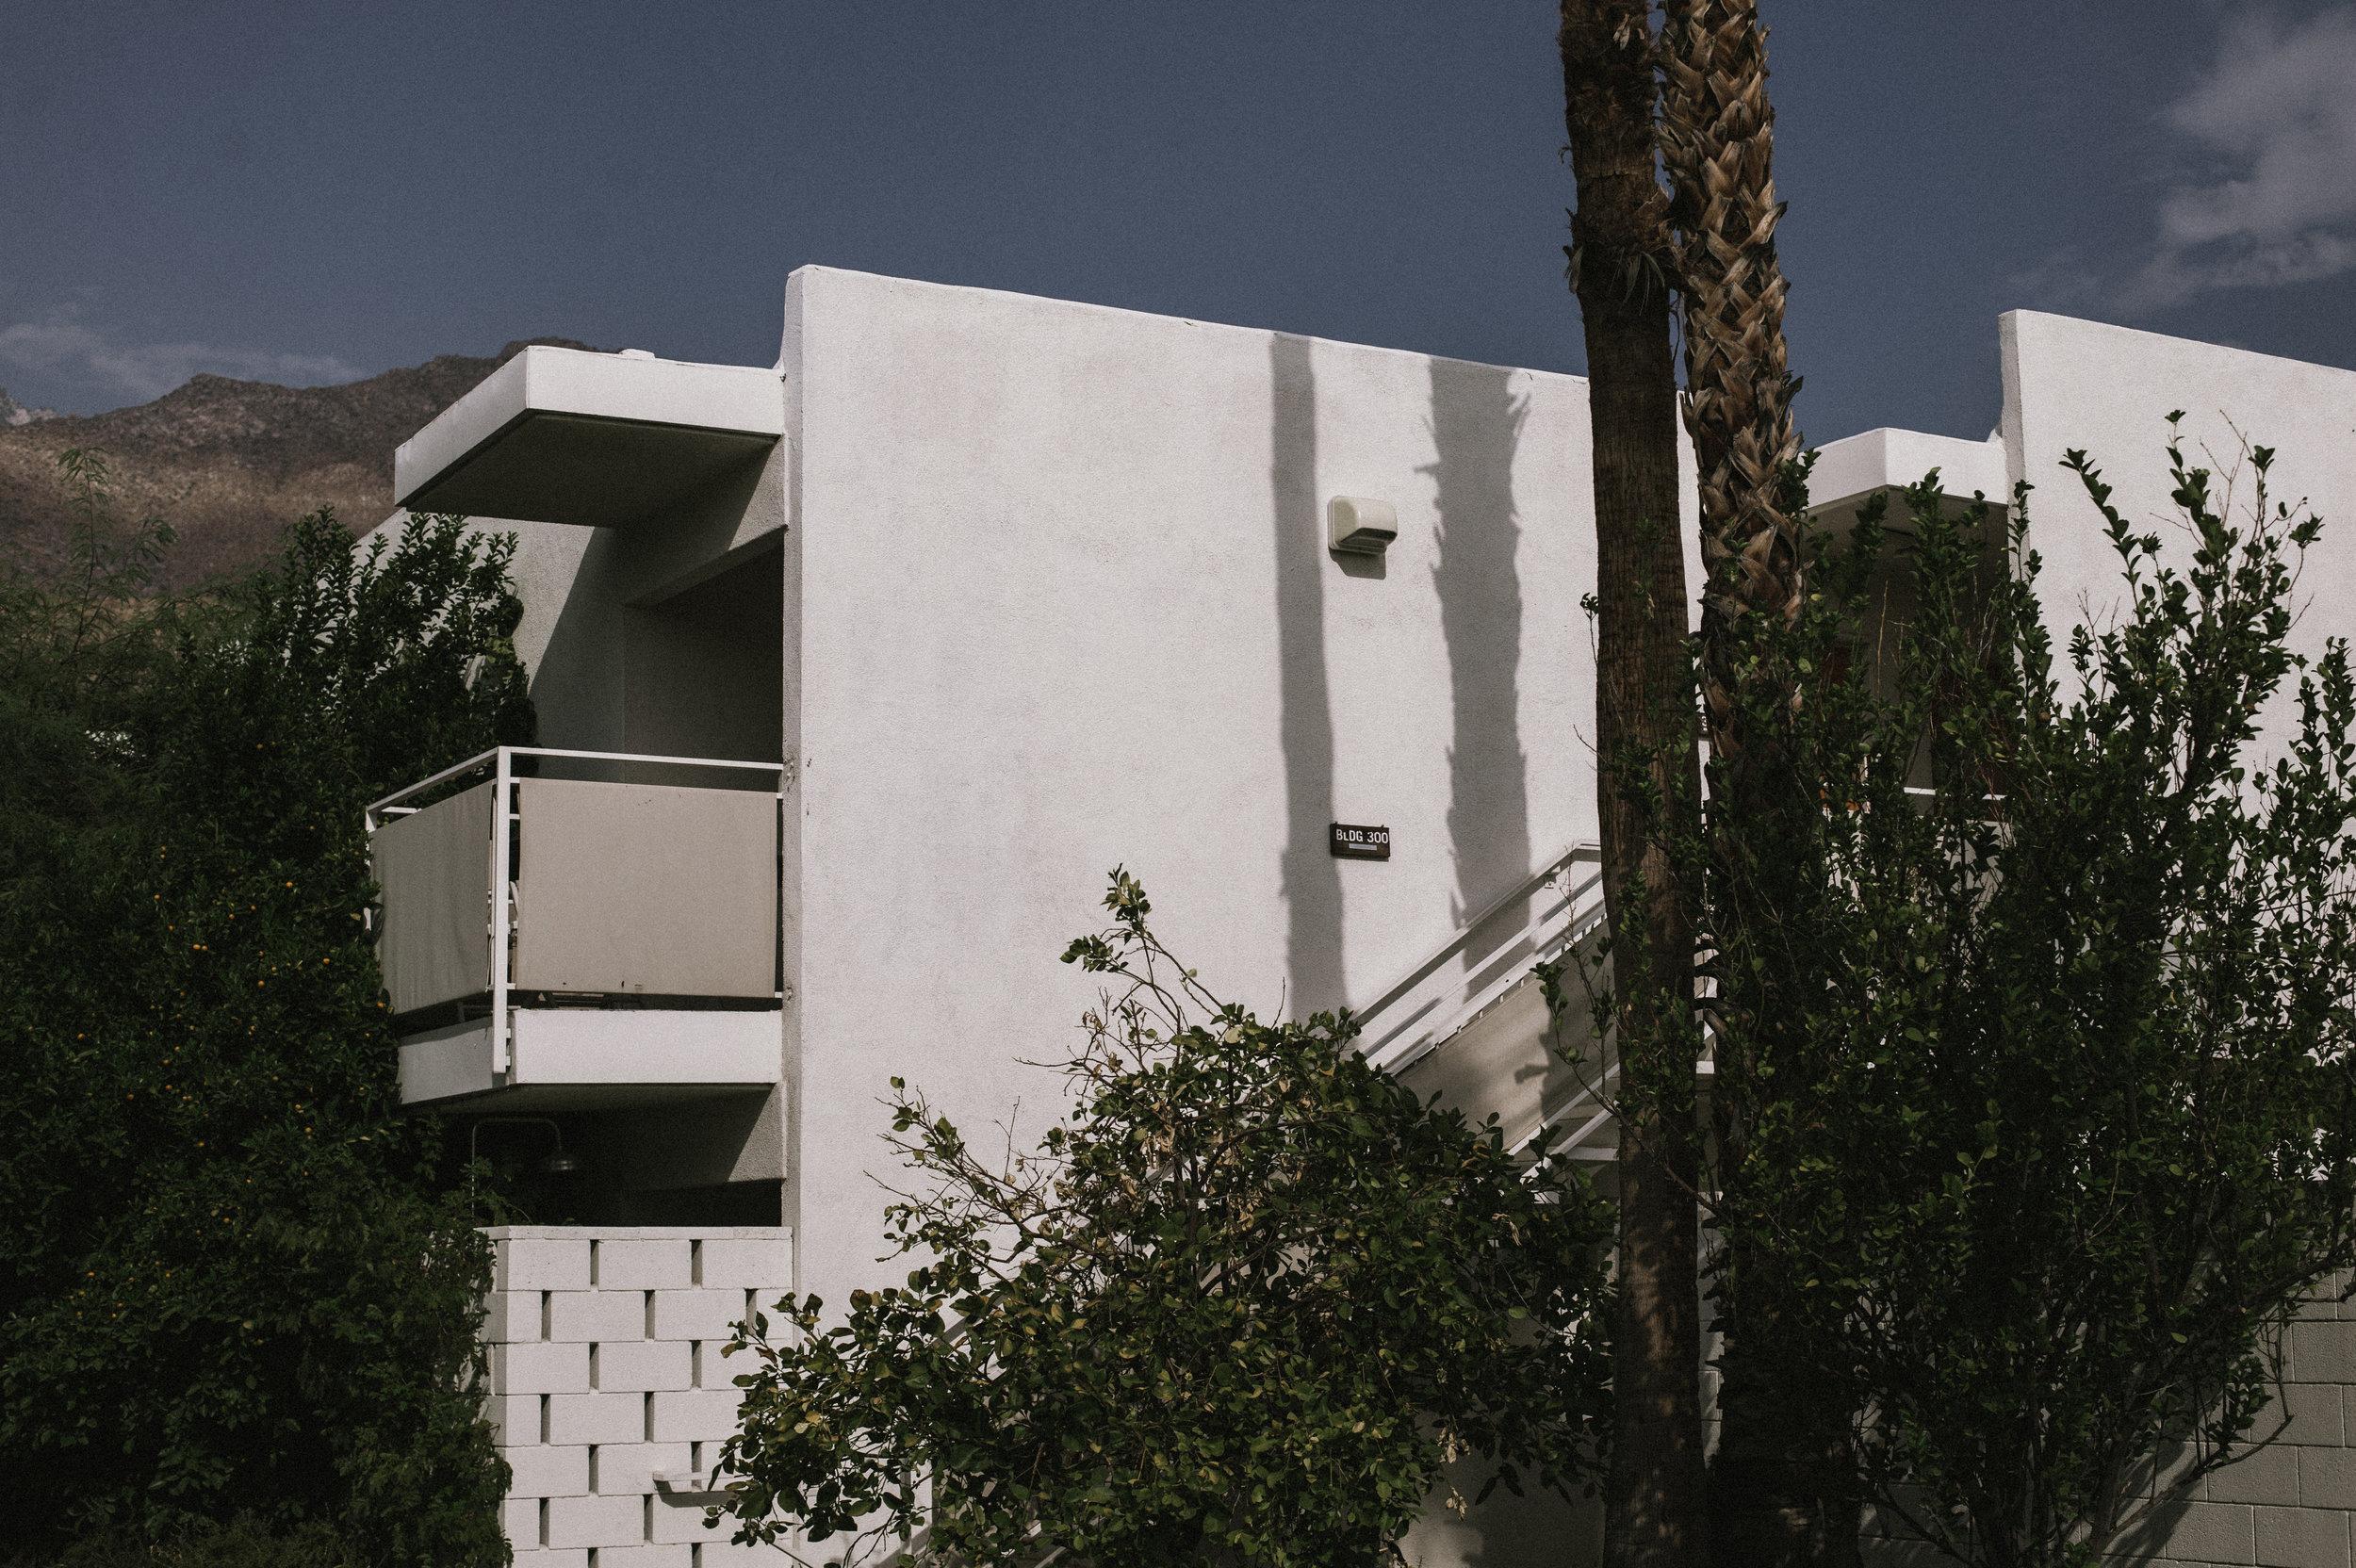 The-Glossier-Ace-Hotel-Palm-Springs-CA-47.jpg